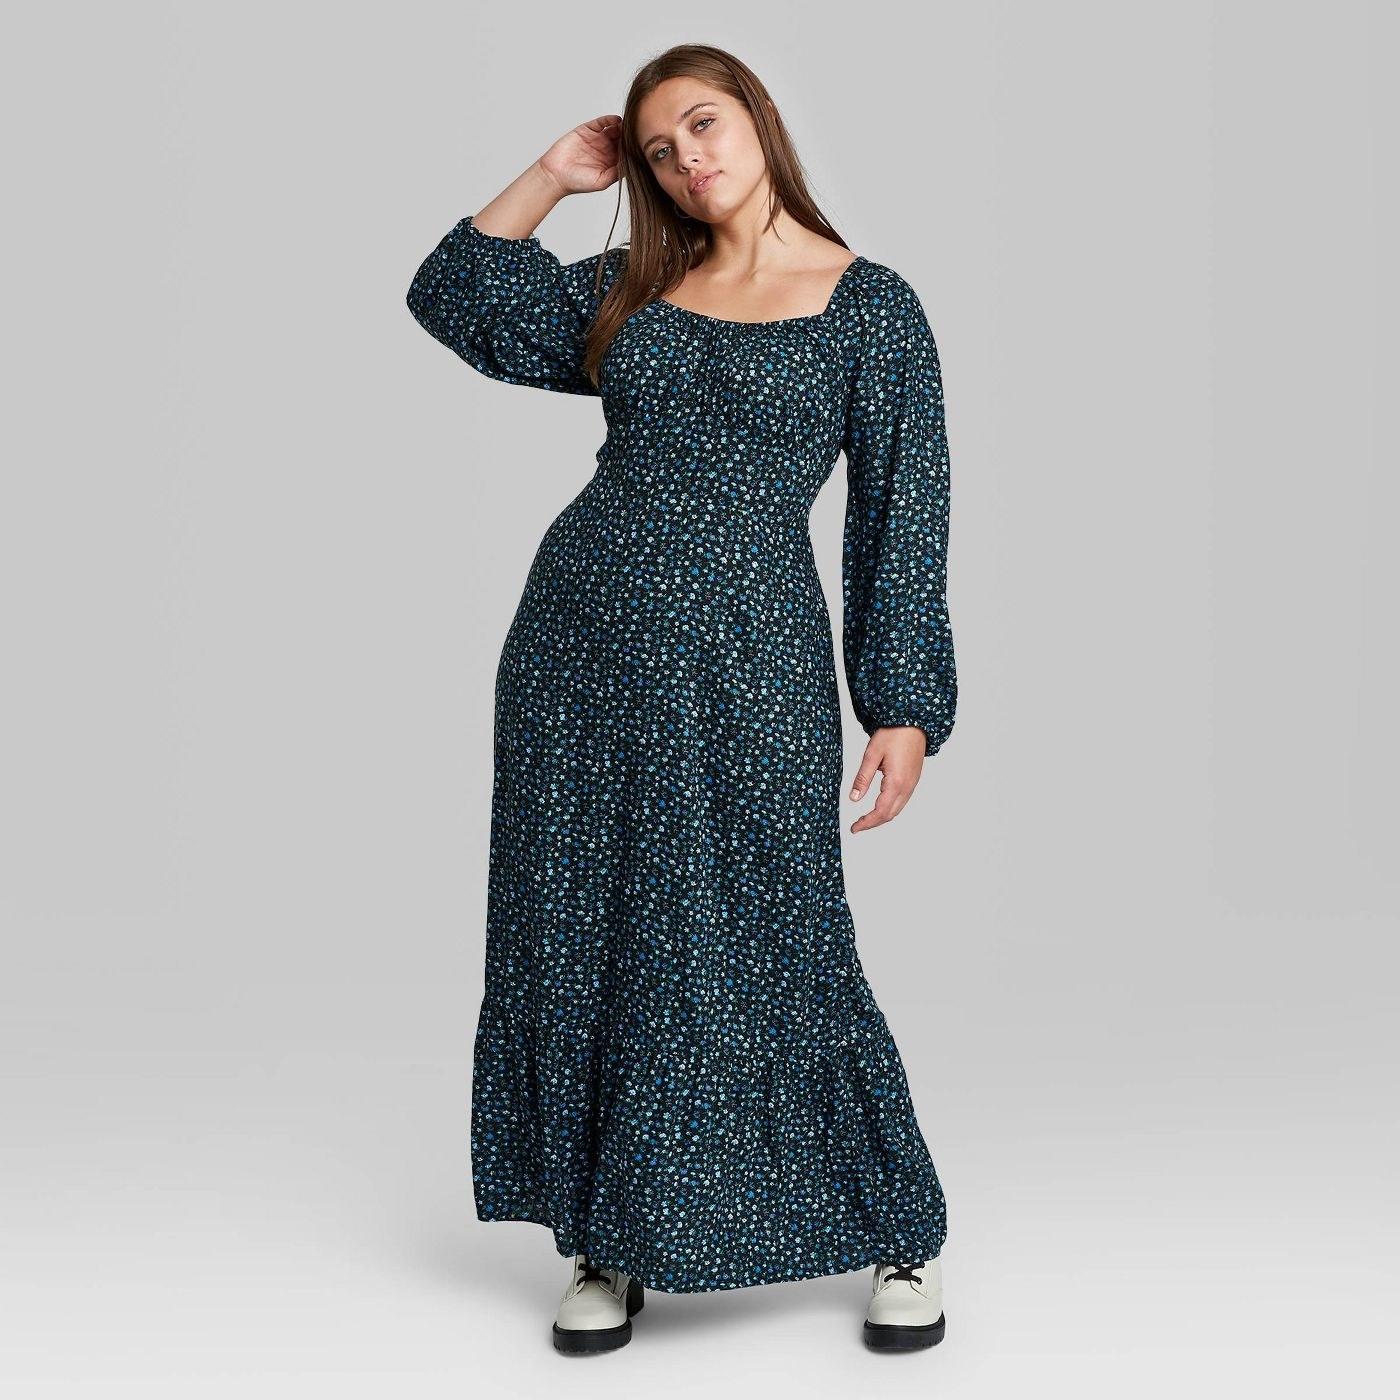 Model in floral print long sleeve dress